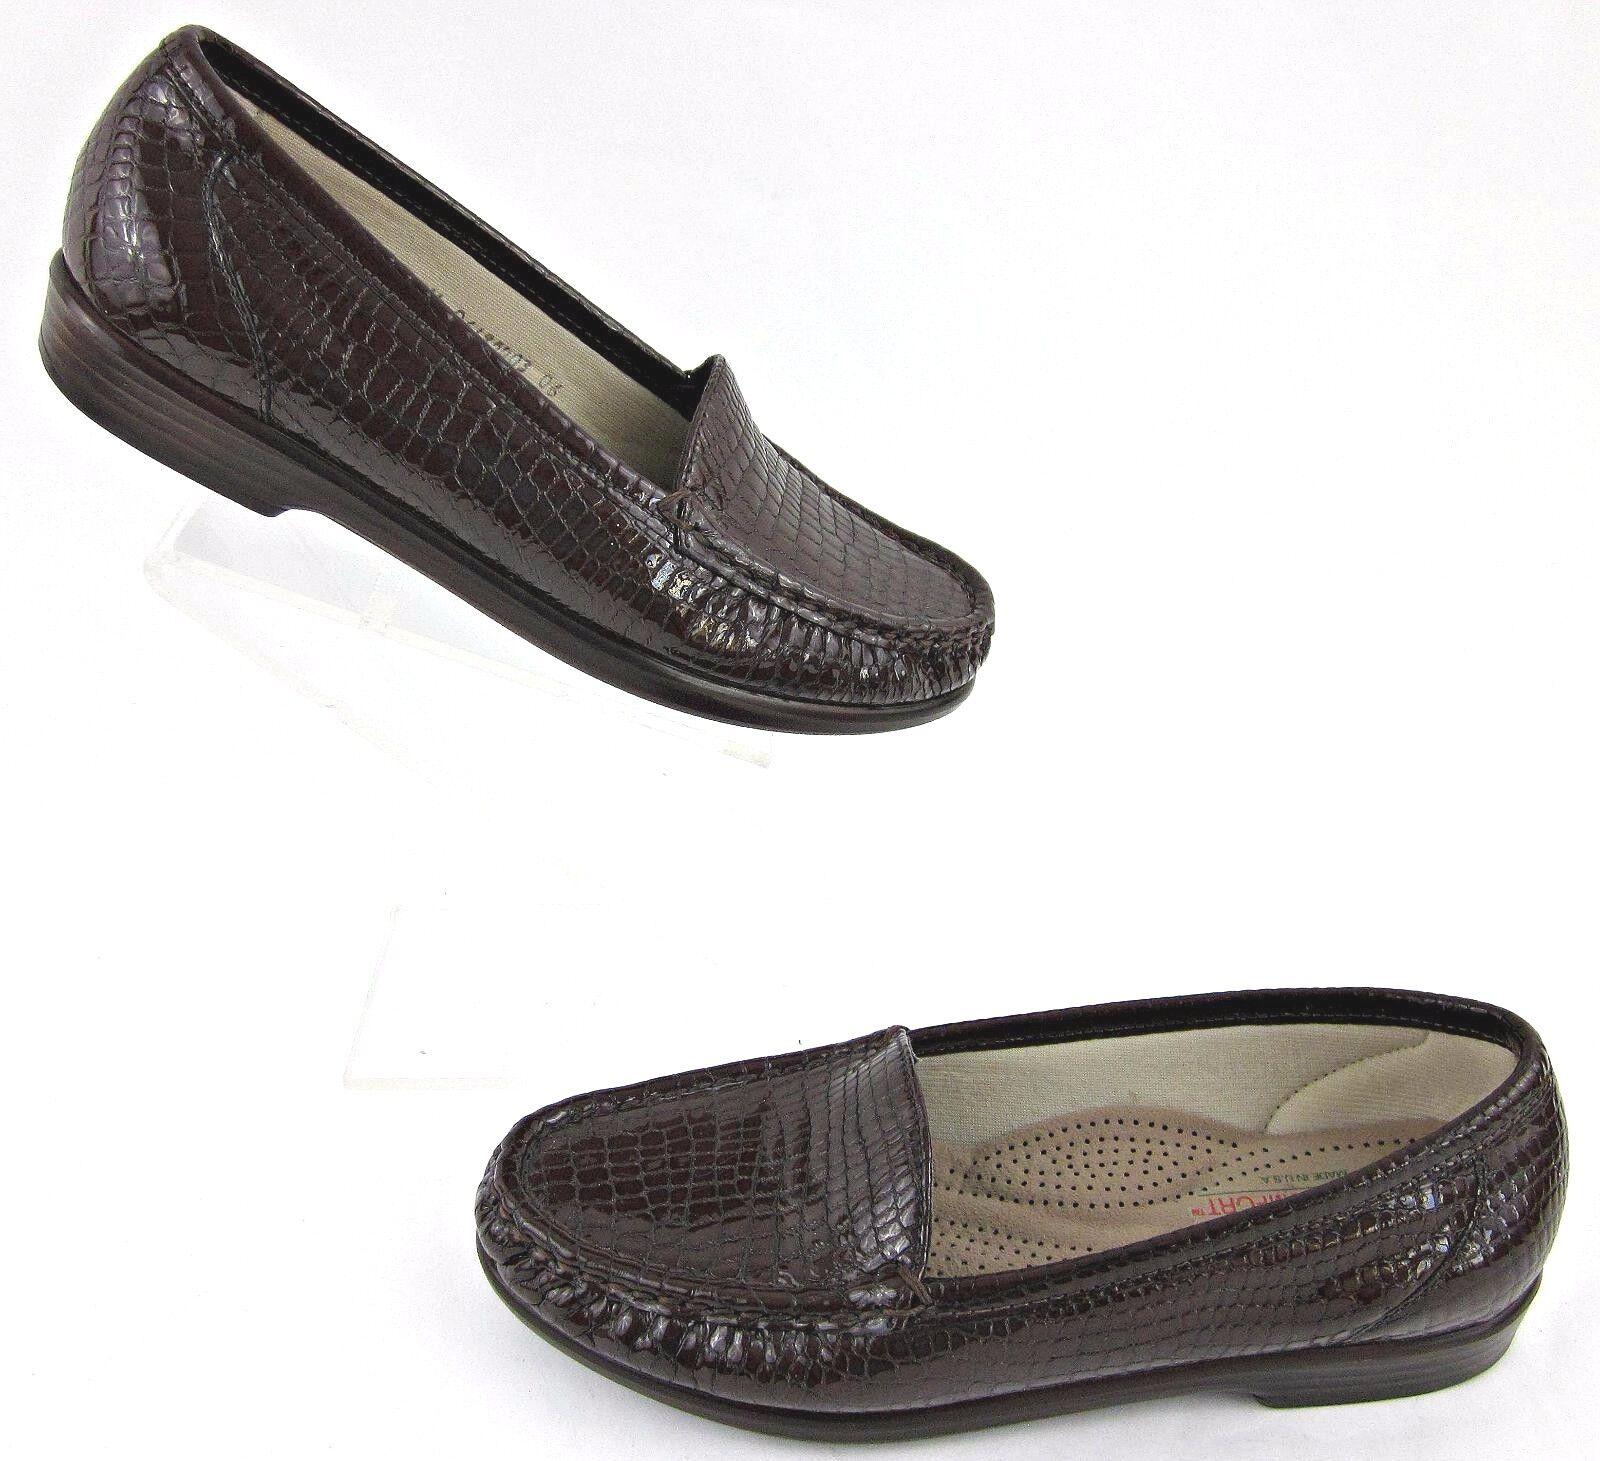 SAS 'Simplify' 'Simplify' Loafers SAS Moccasin Loafers 'Simplify' marrone Croc Pelle Sz   d223eb